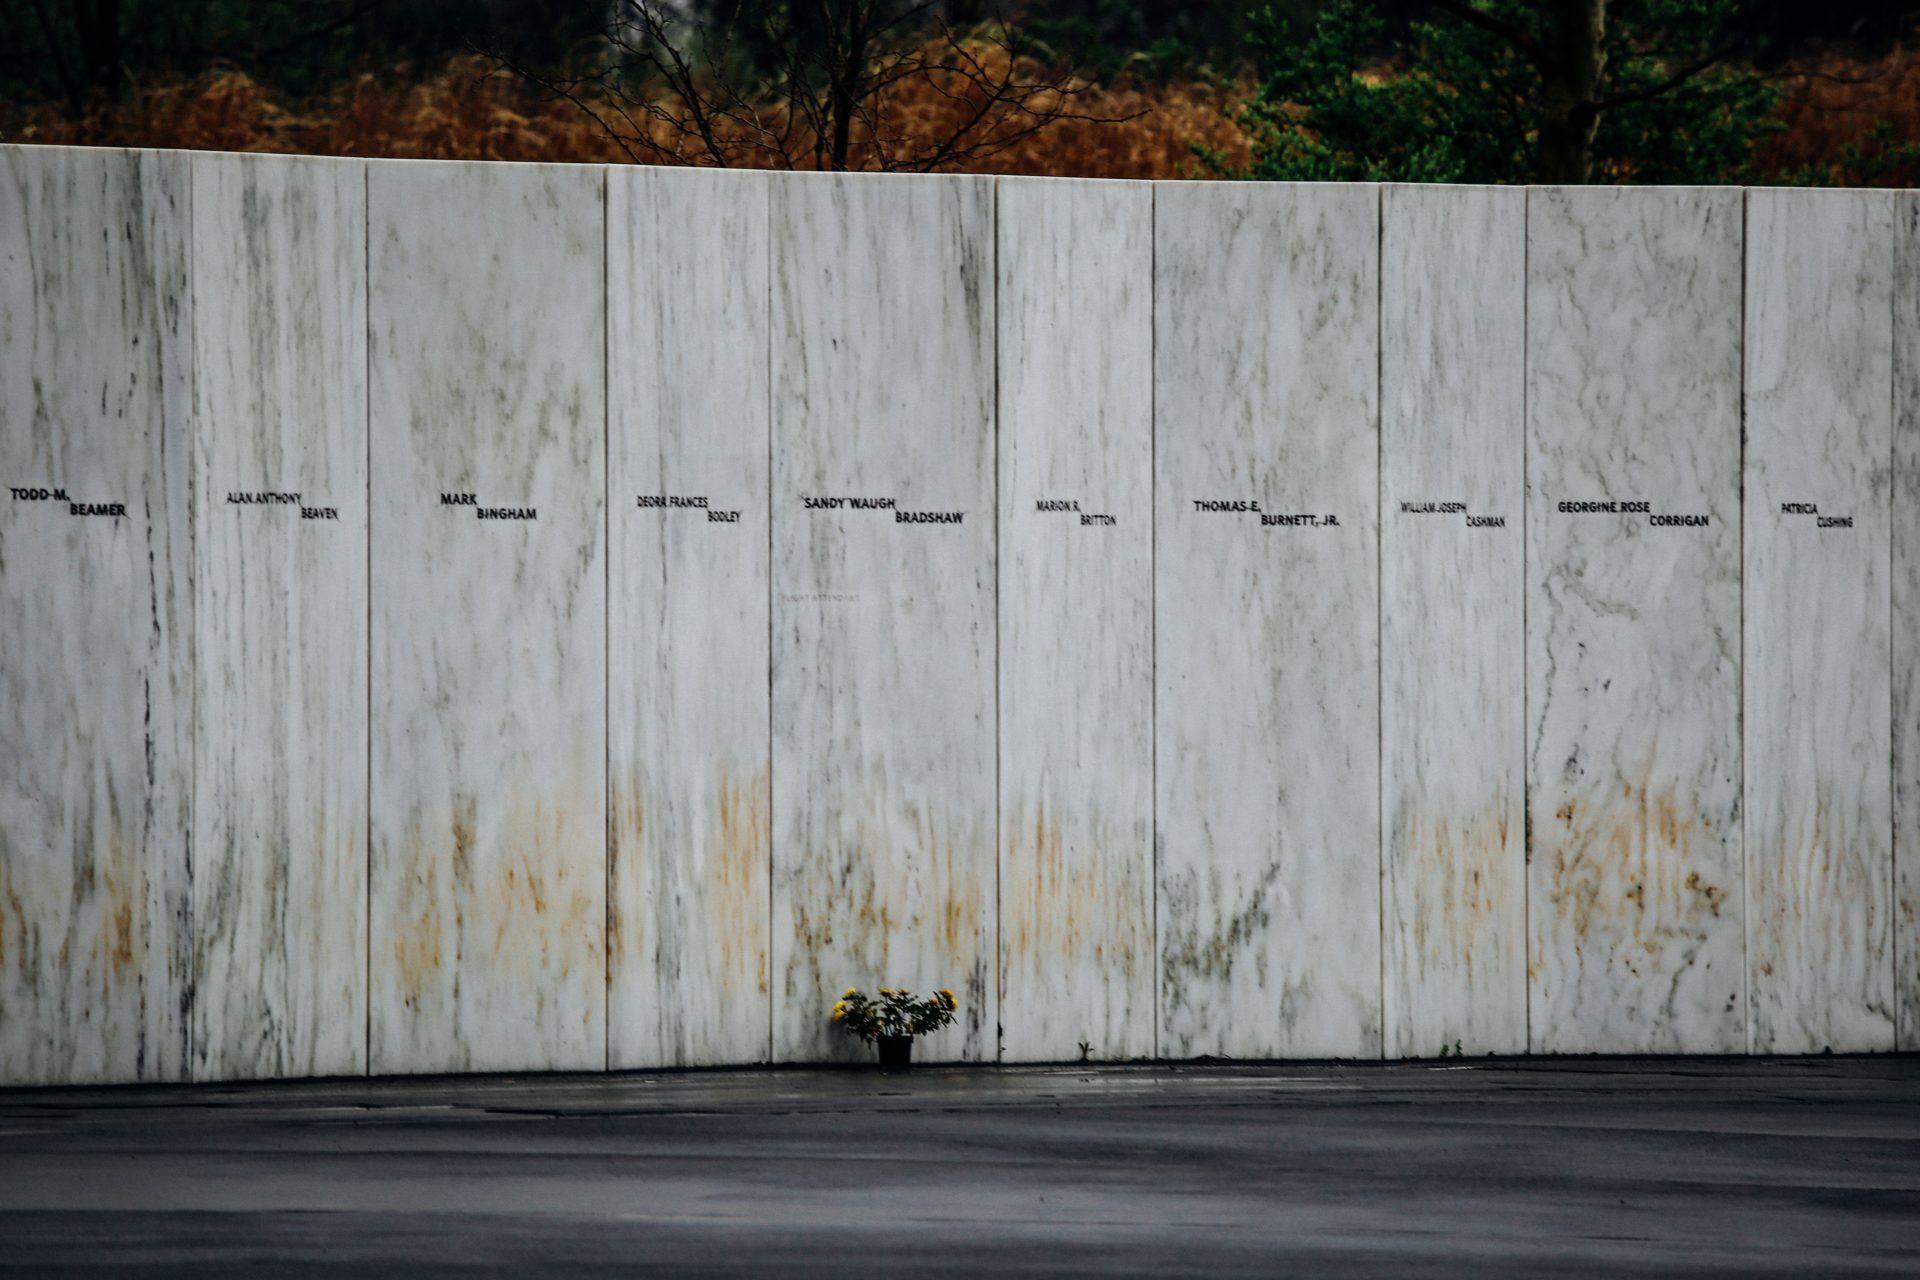 The Wall of Names at the Flight 93 National Memorial